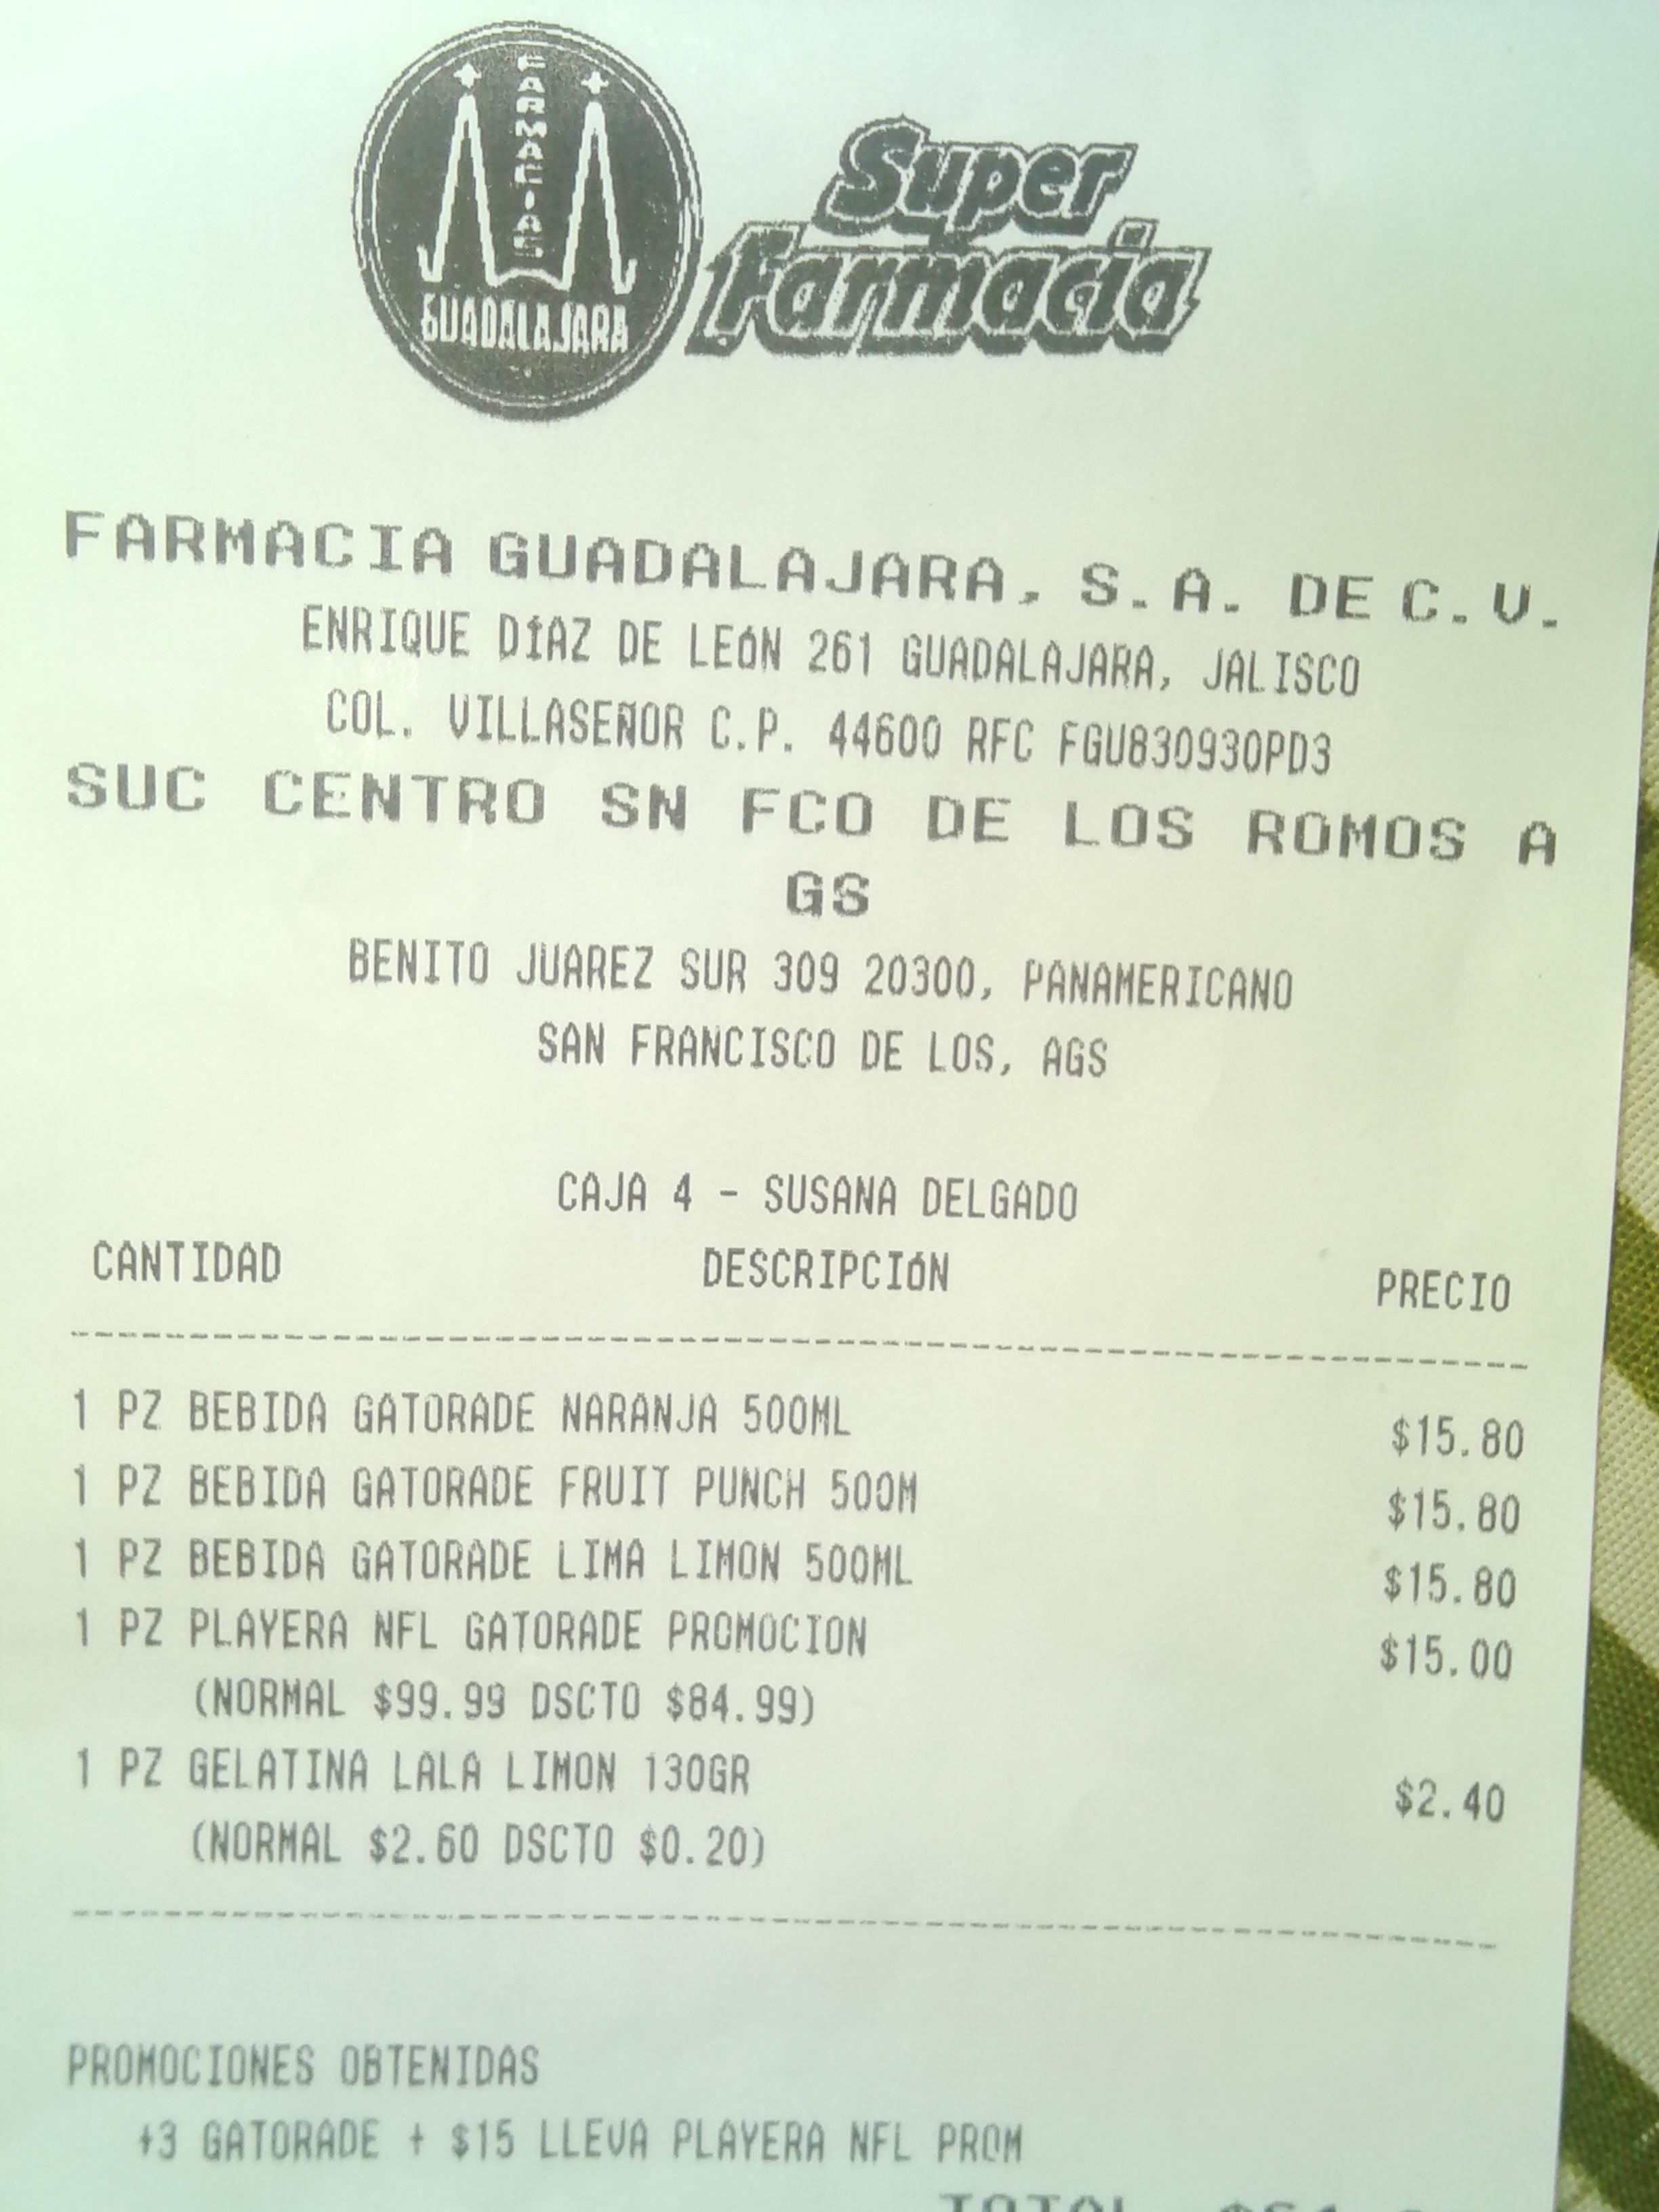 Farmacias Guadalajara: playera de la NFL a $15 comprando 3 Gatorades